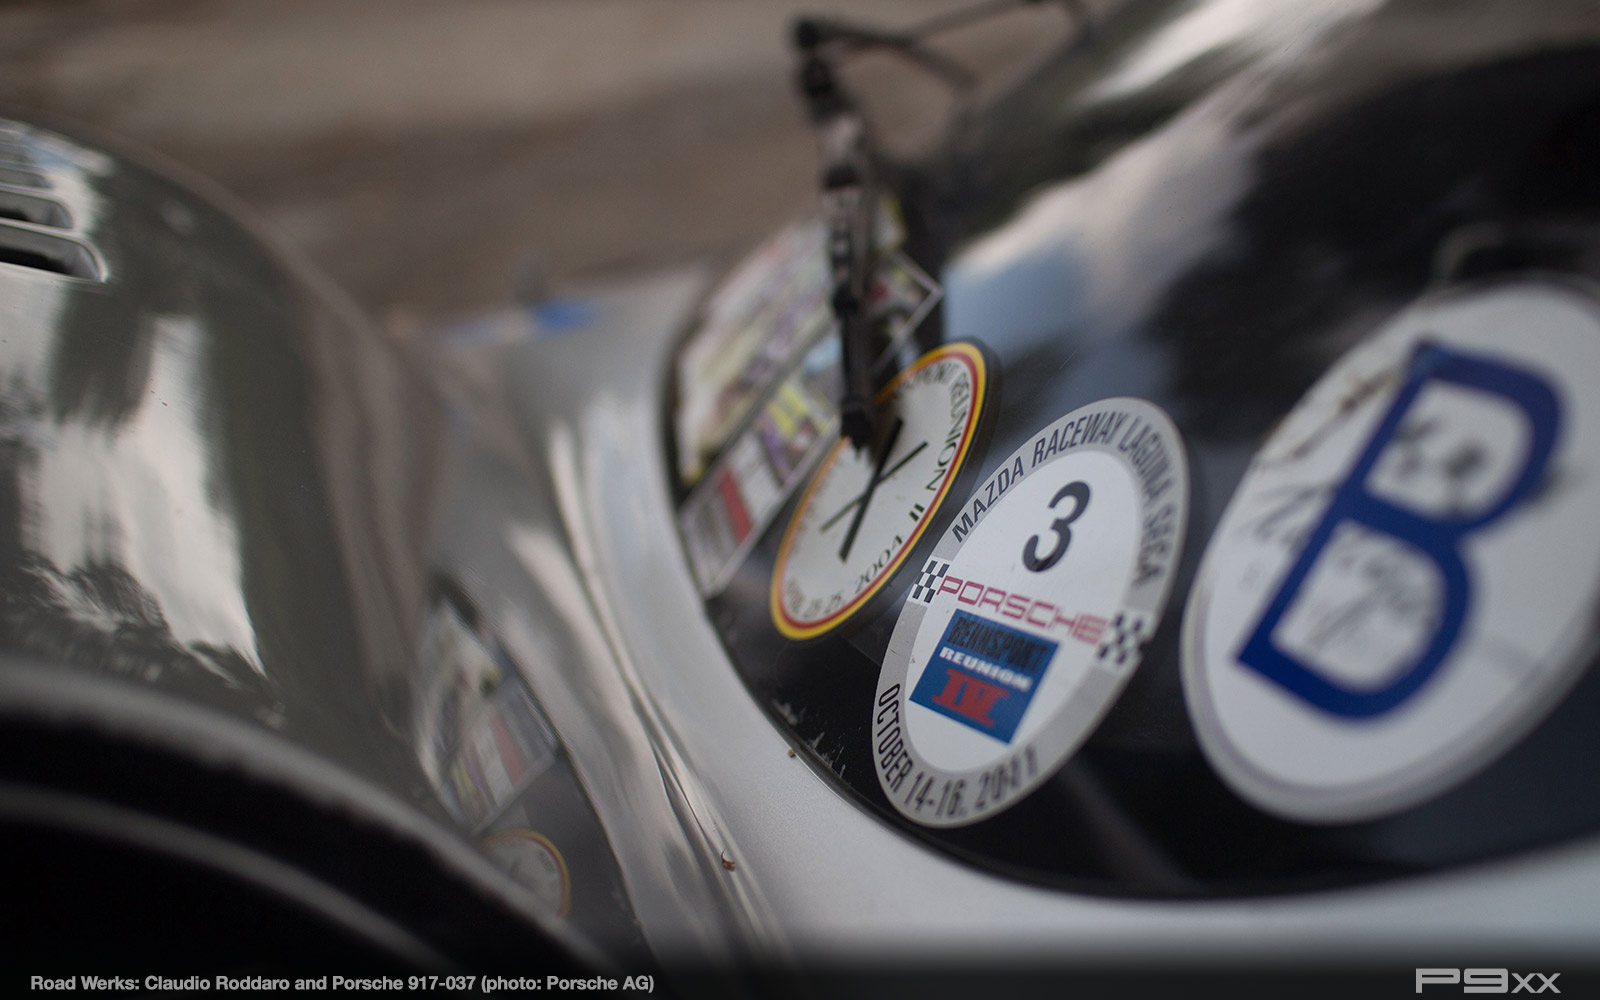 Porsche-917-037-Martini-Racing-Monaco-2018-297